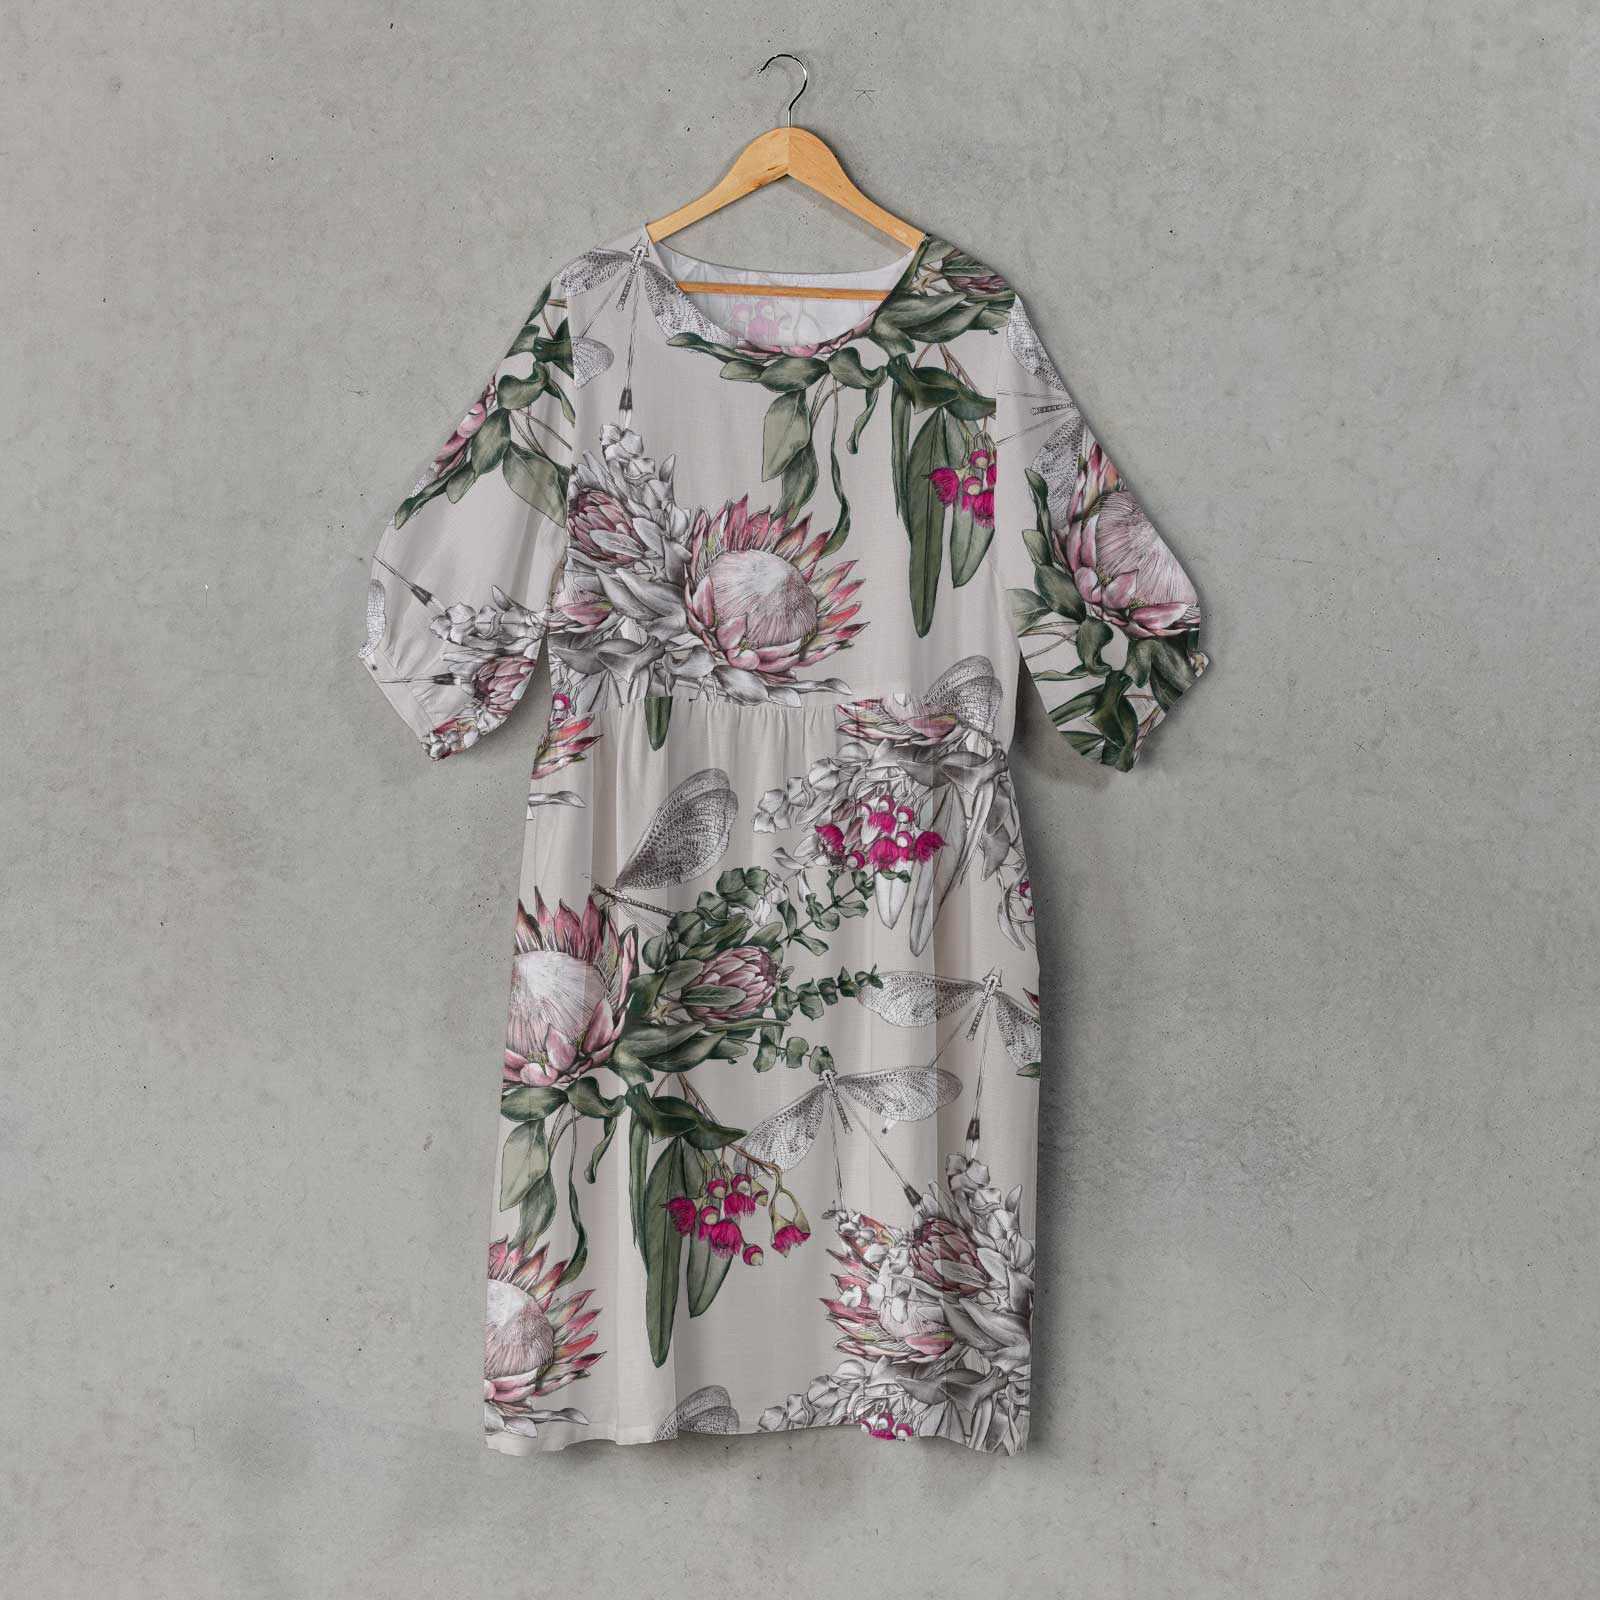 PB-Smock-Dress-on-Hanger-Mockup